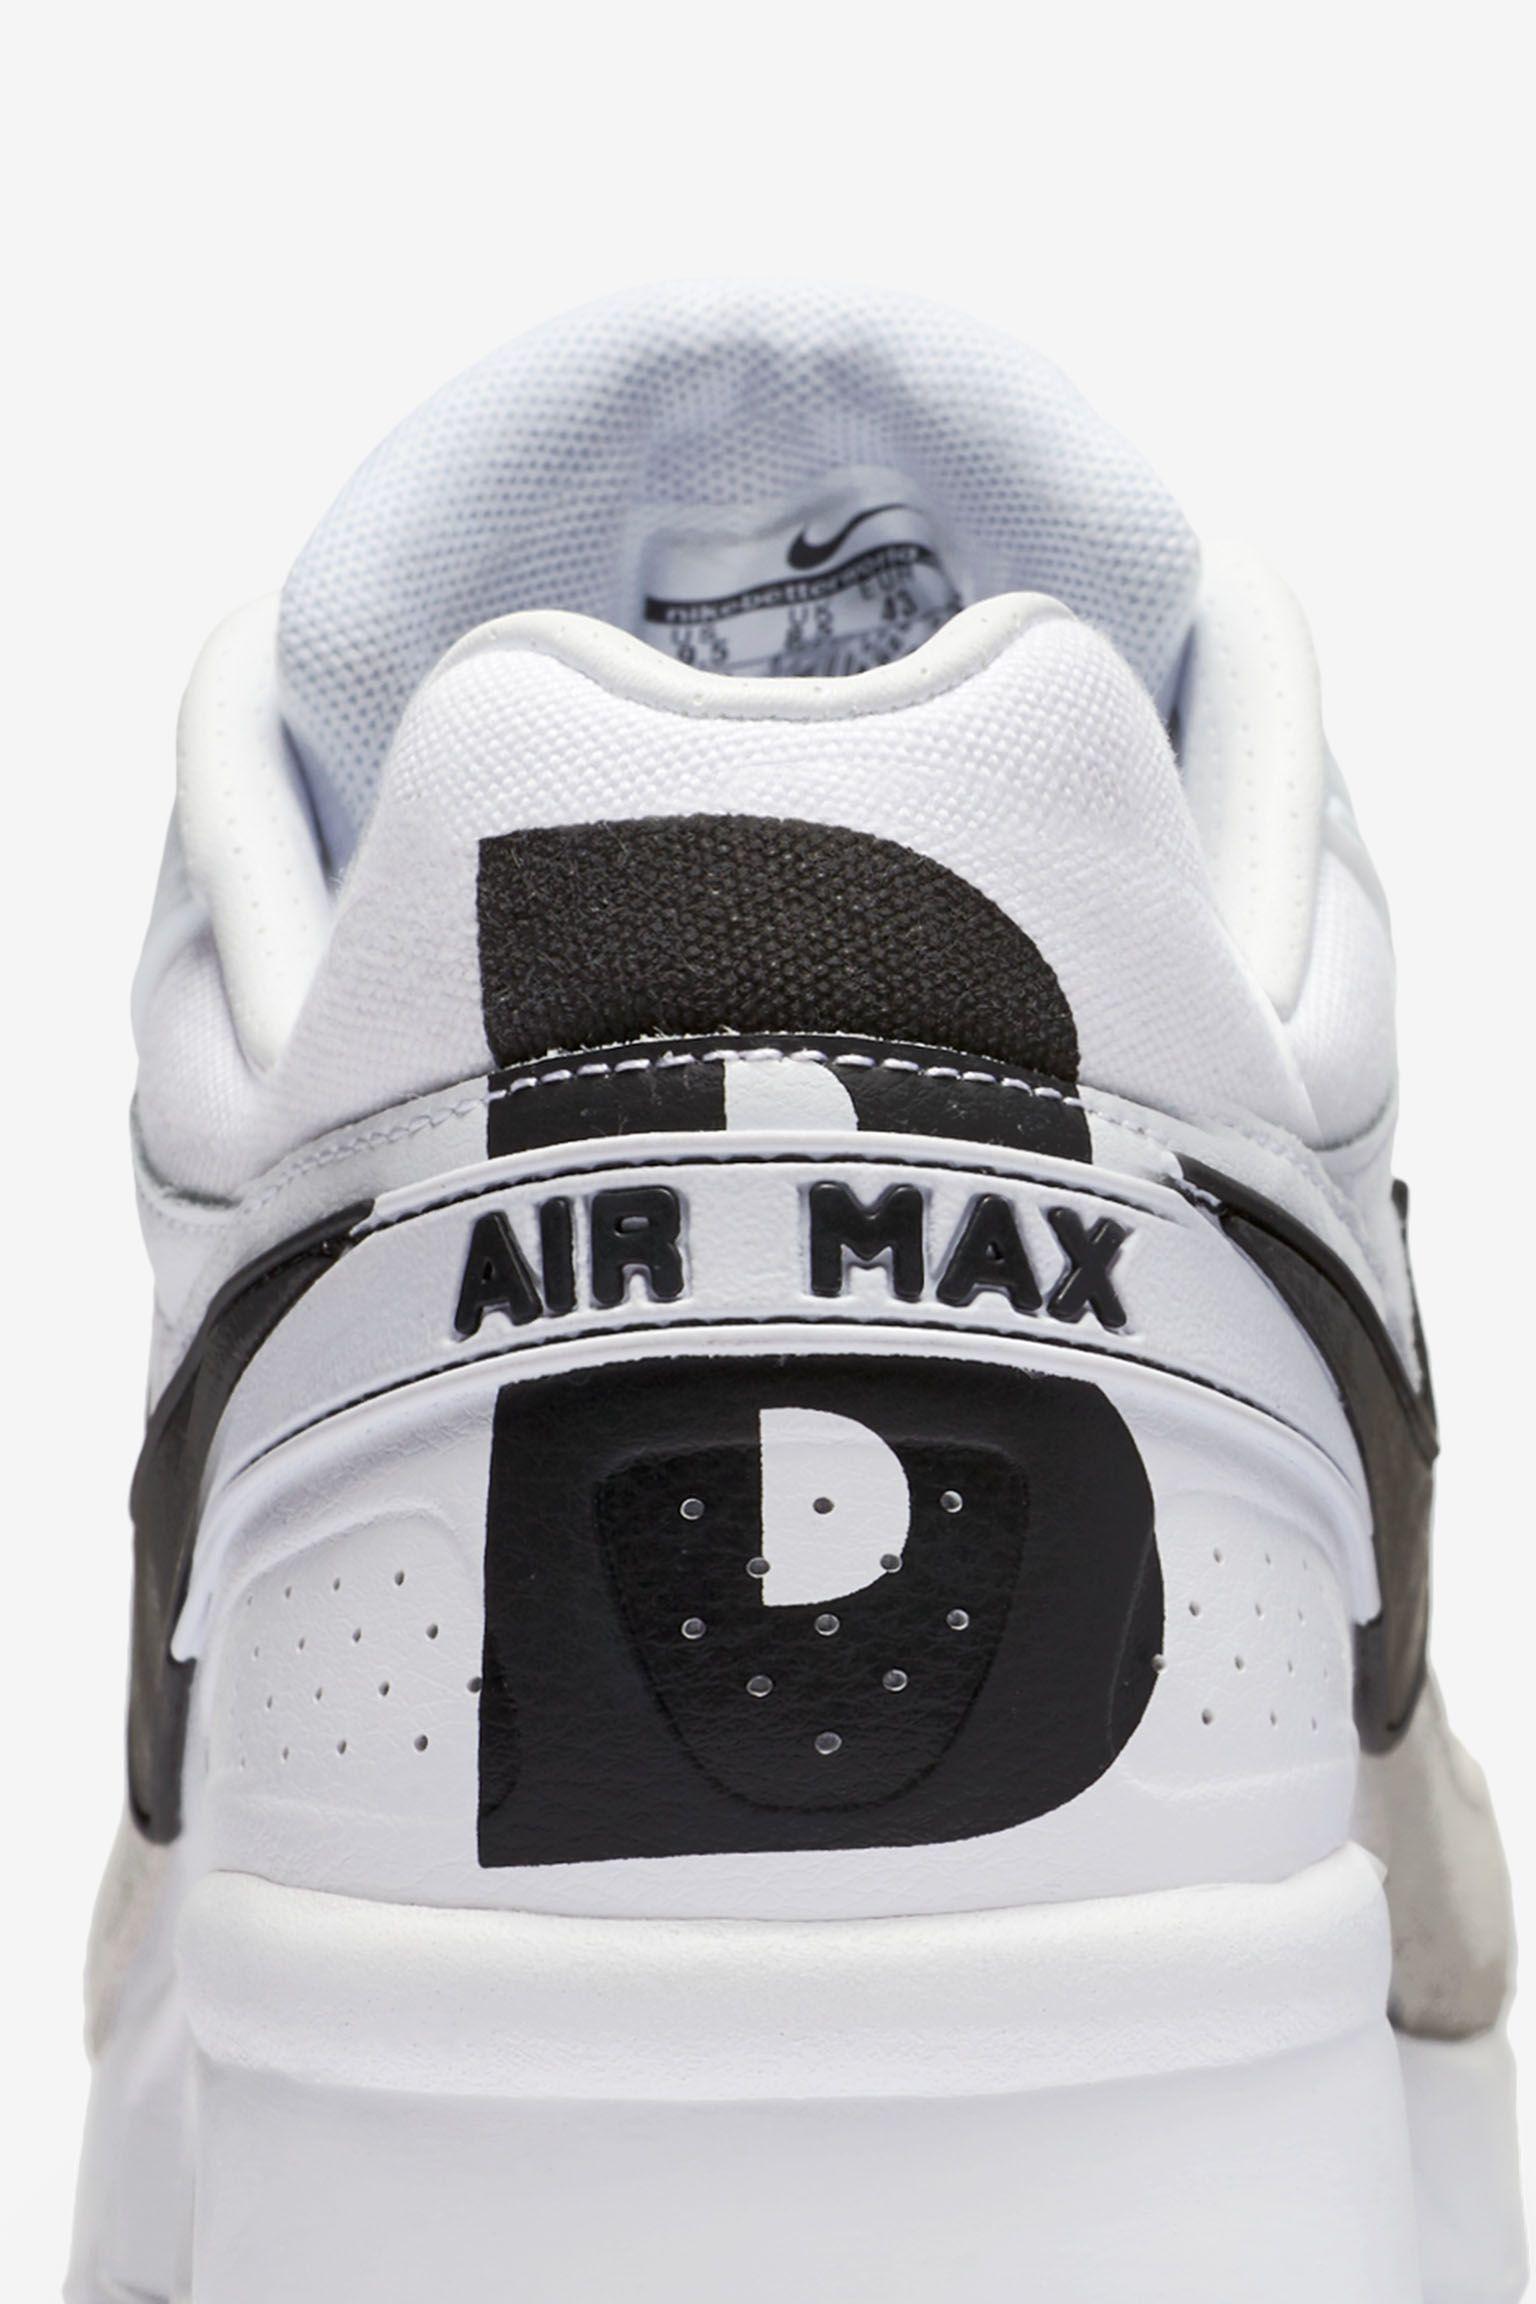 Nike Air Max BW Premium 'Big Statement' Release Date